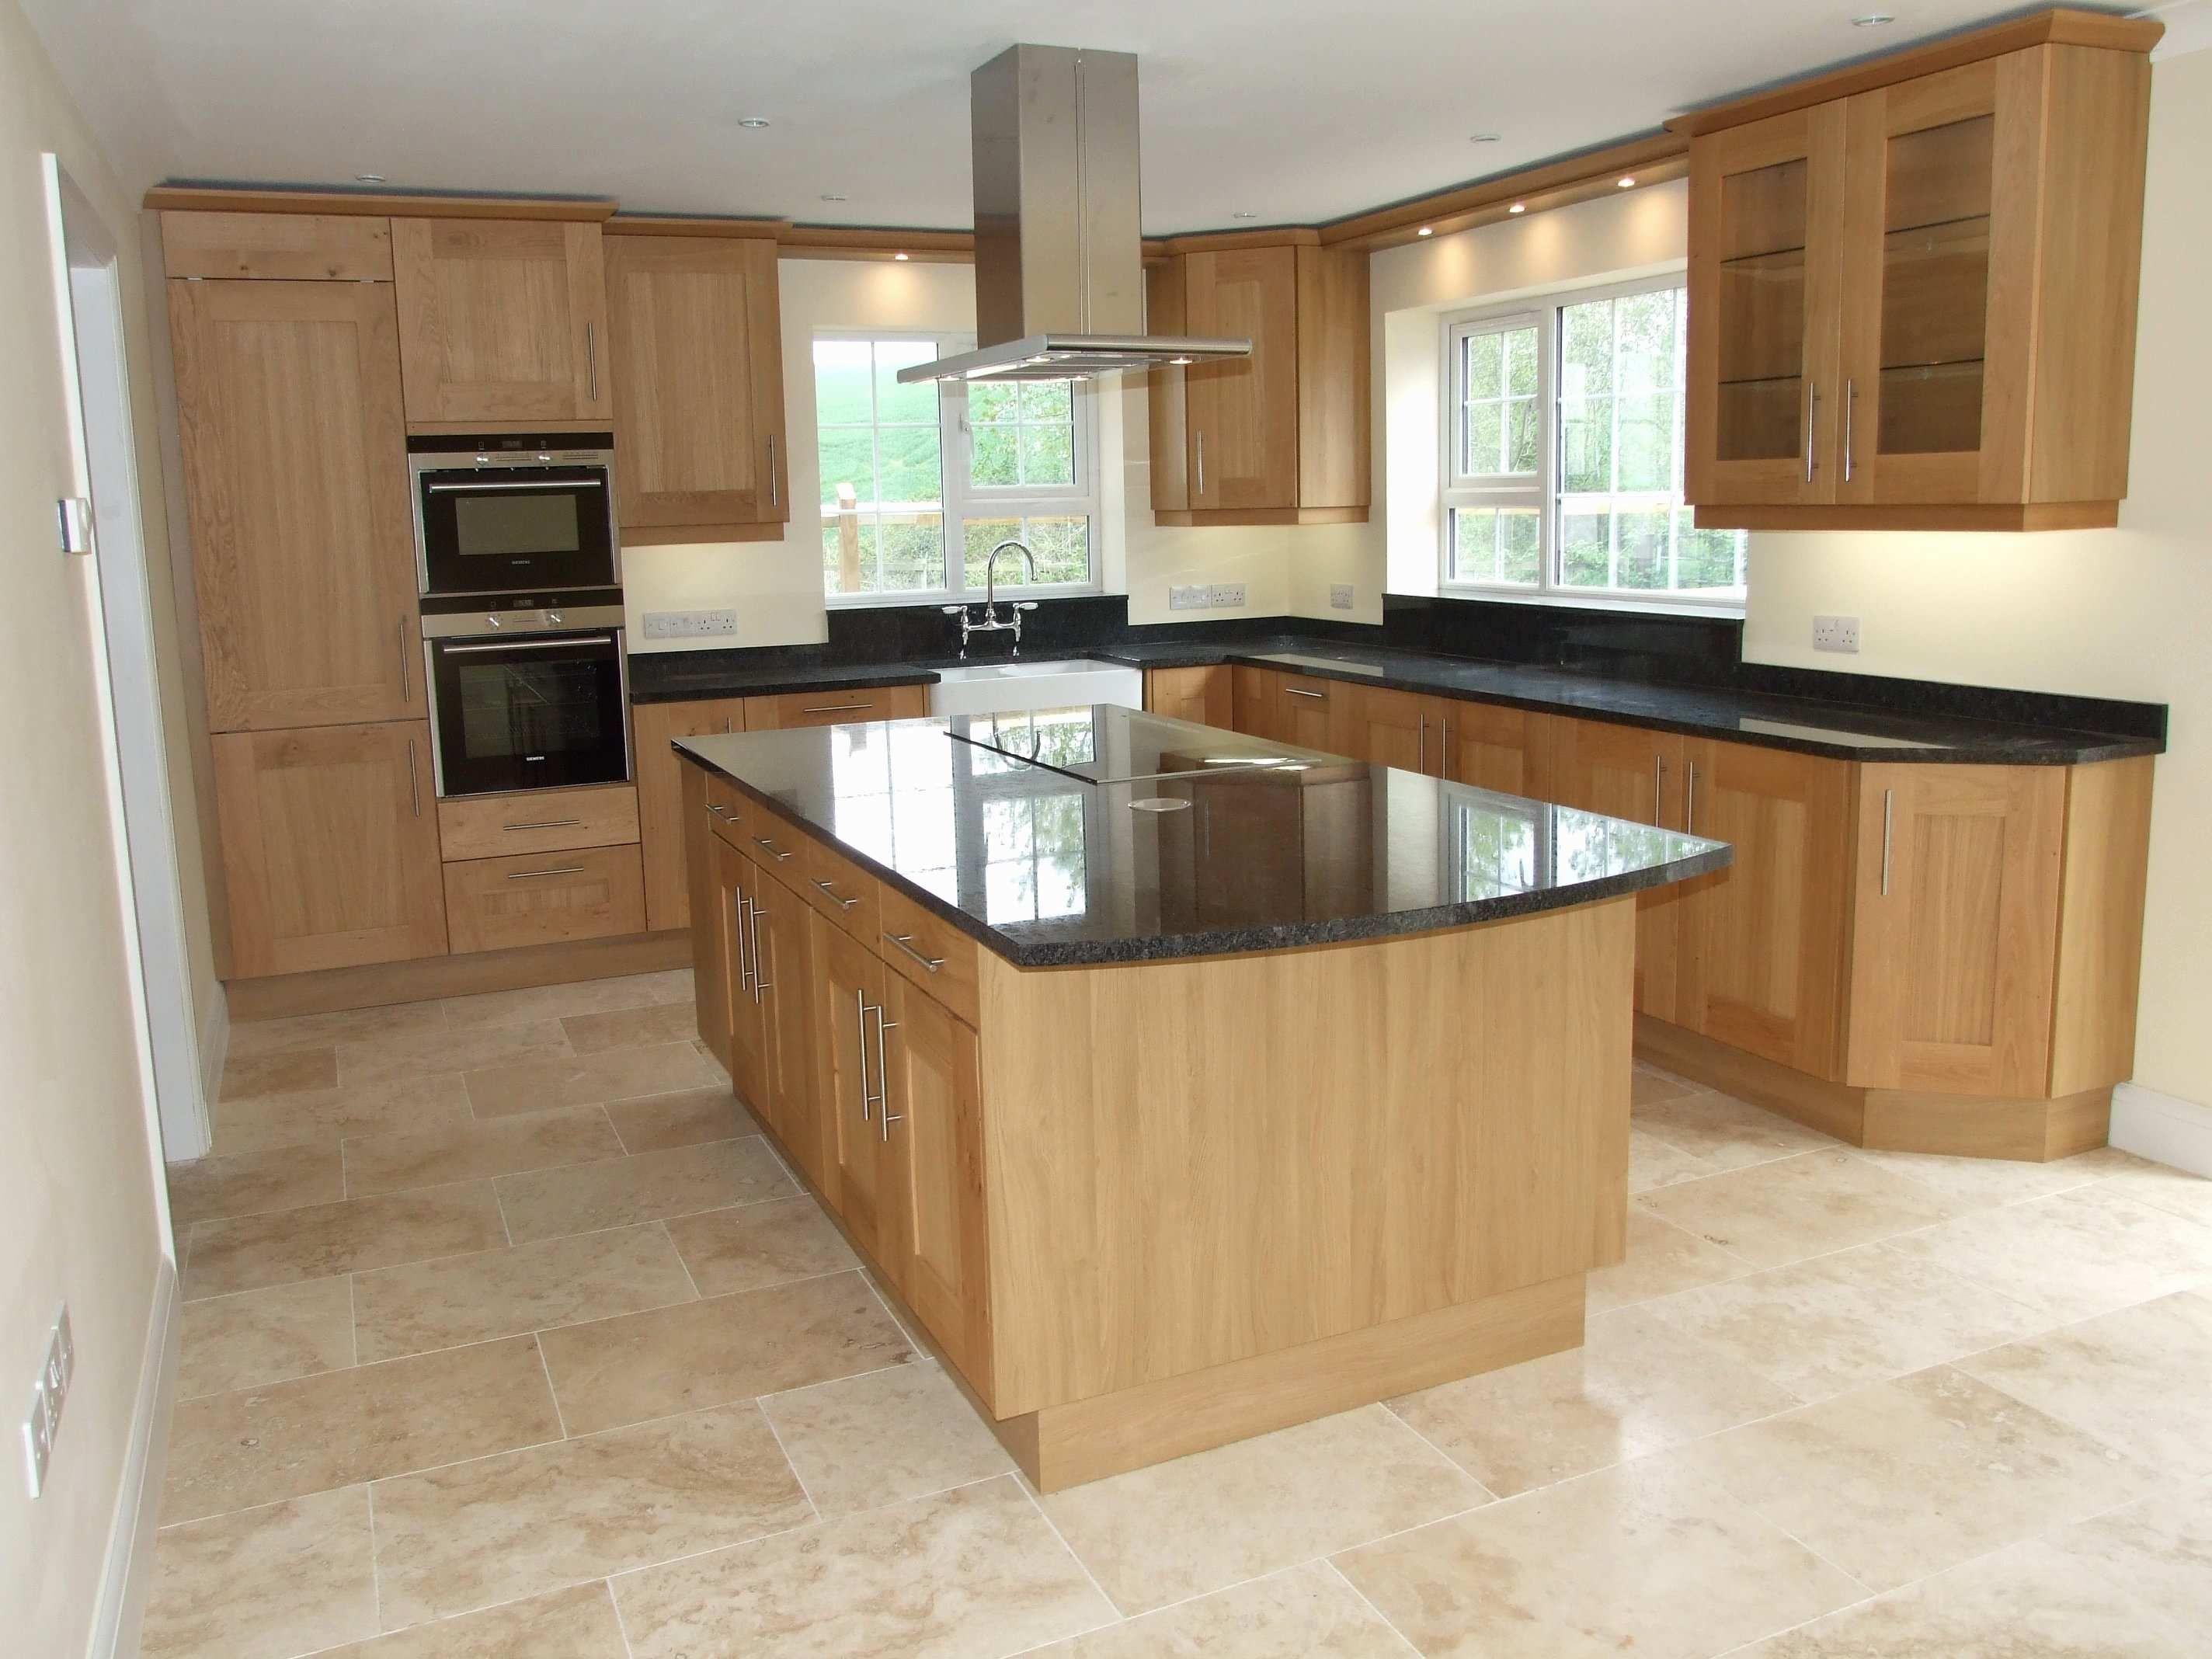 Kitchen Designs With Oak Cabinets New Kitchen Flooring Ideas With Oak Cabinets Modern Oak Kitchen Kitchen Design Honey Oak Cabinets